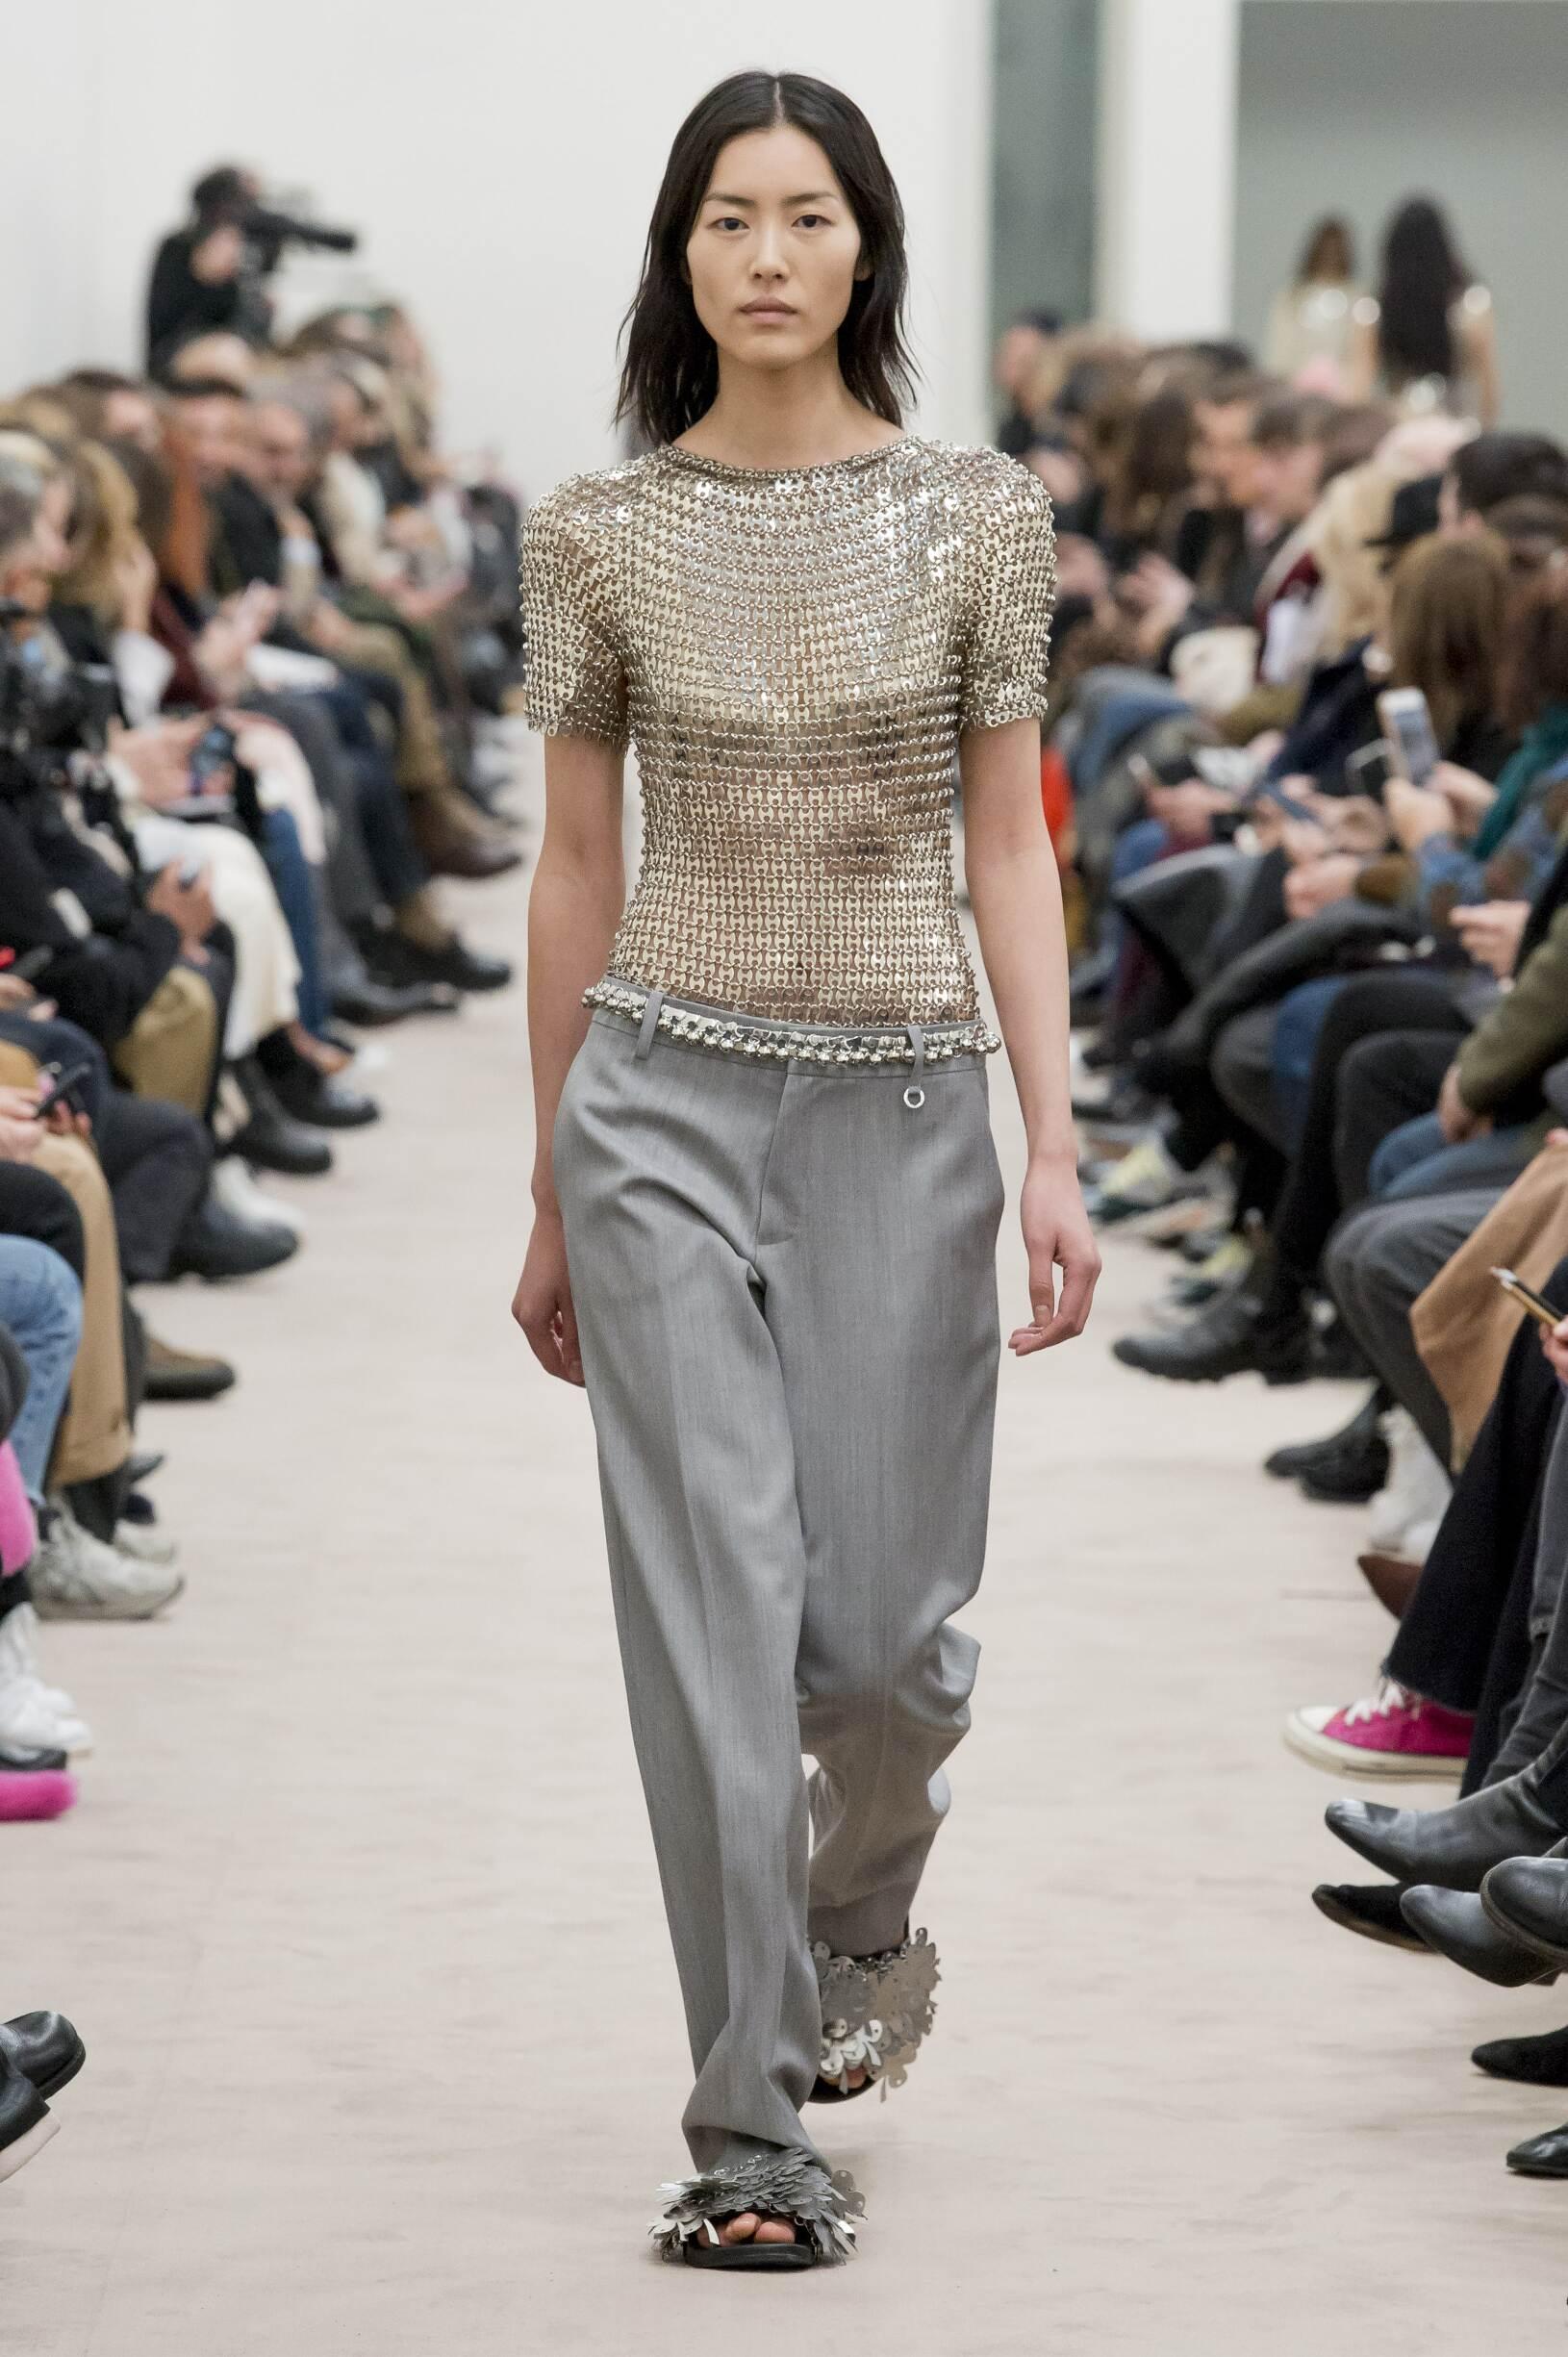 Fashion Woman Model Paco Rabanne Catwalk